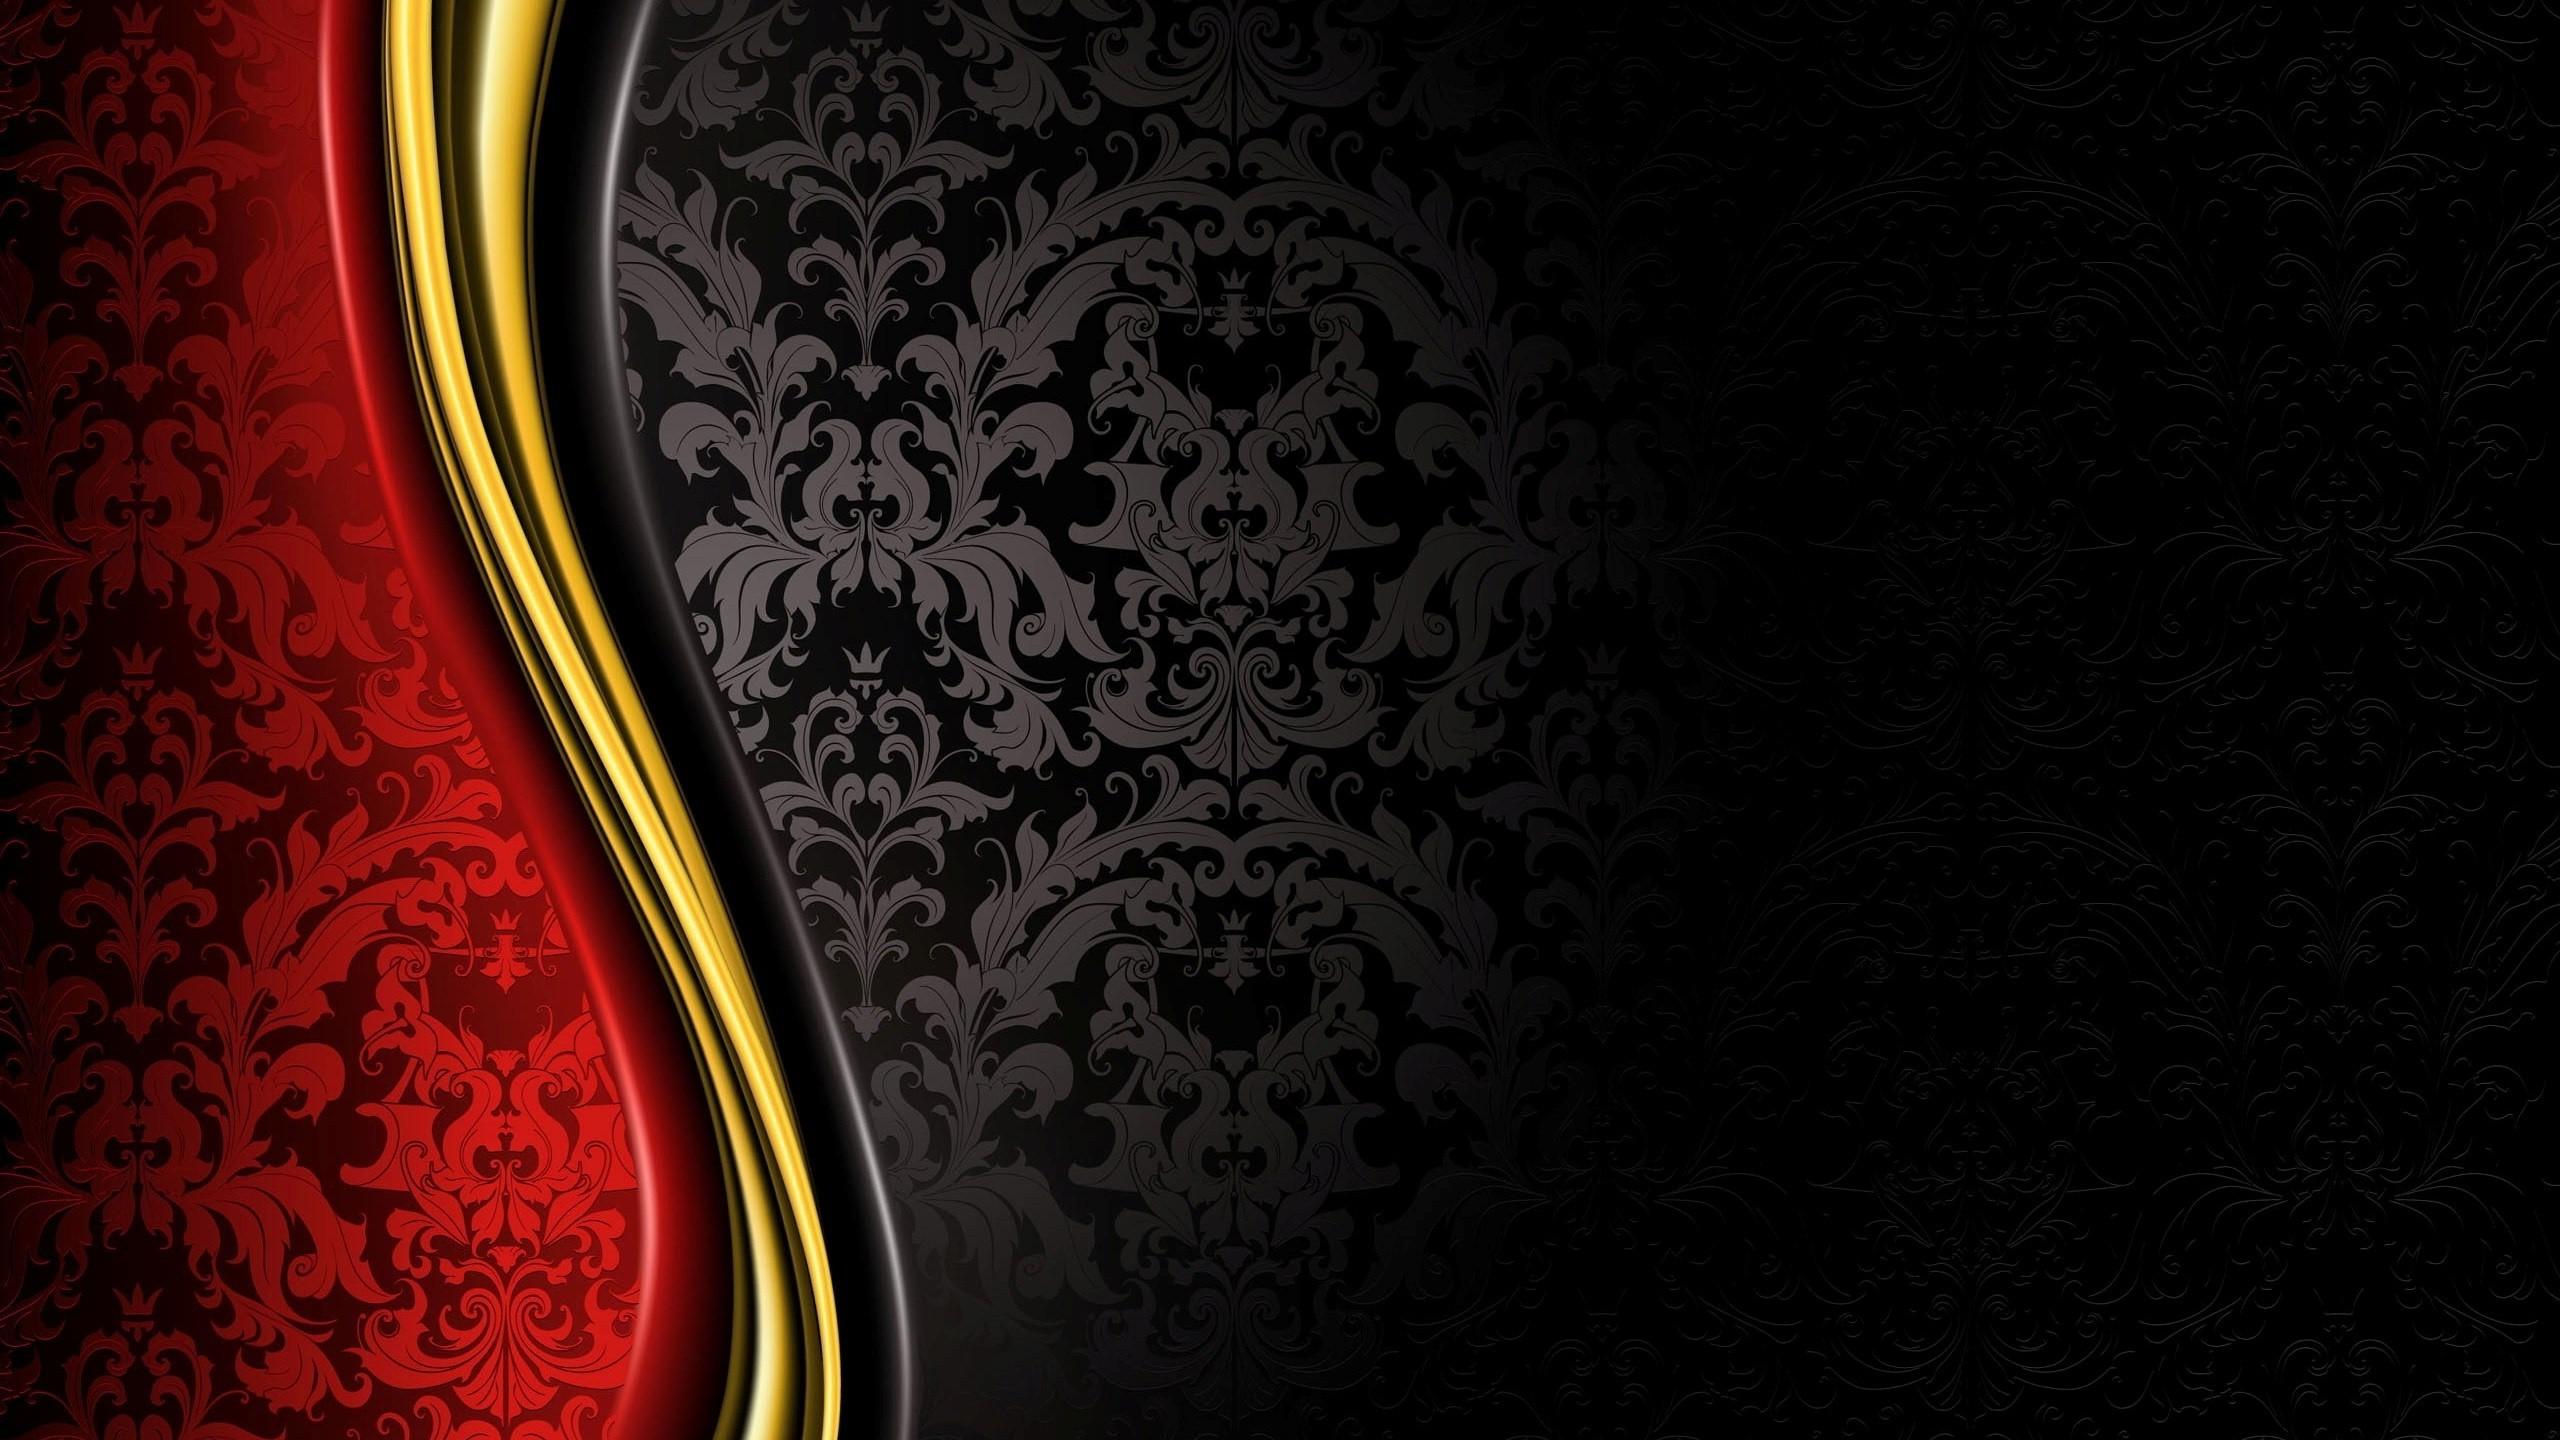 Res: 2560x1440, Black and Gold Glitter Wallpaper Black Gold Fall Random Pins 5 ... - HD